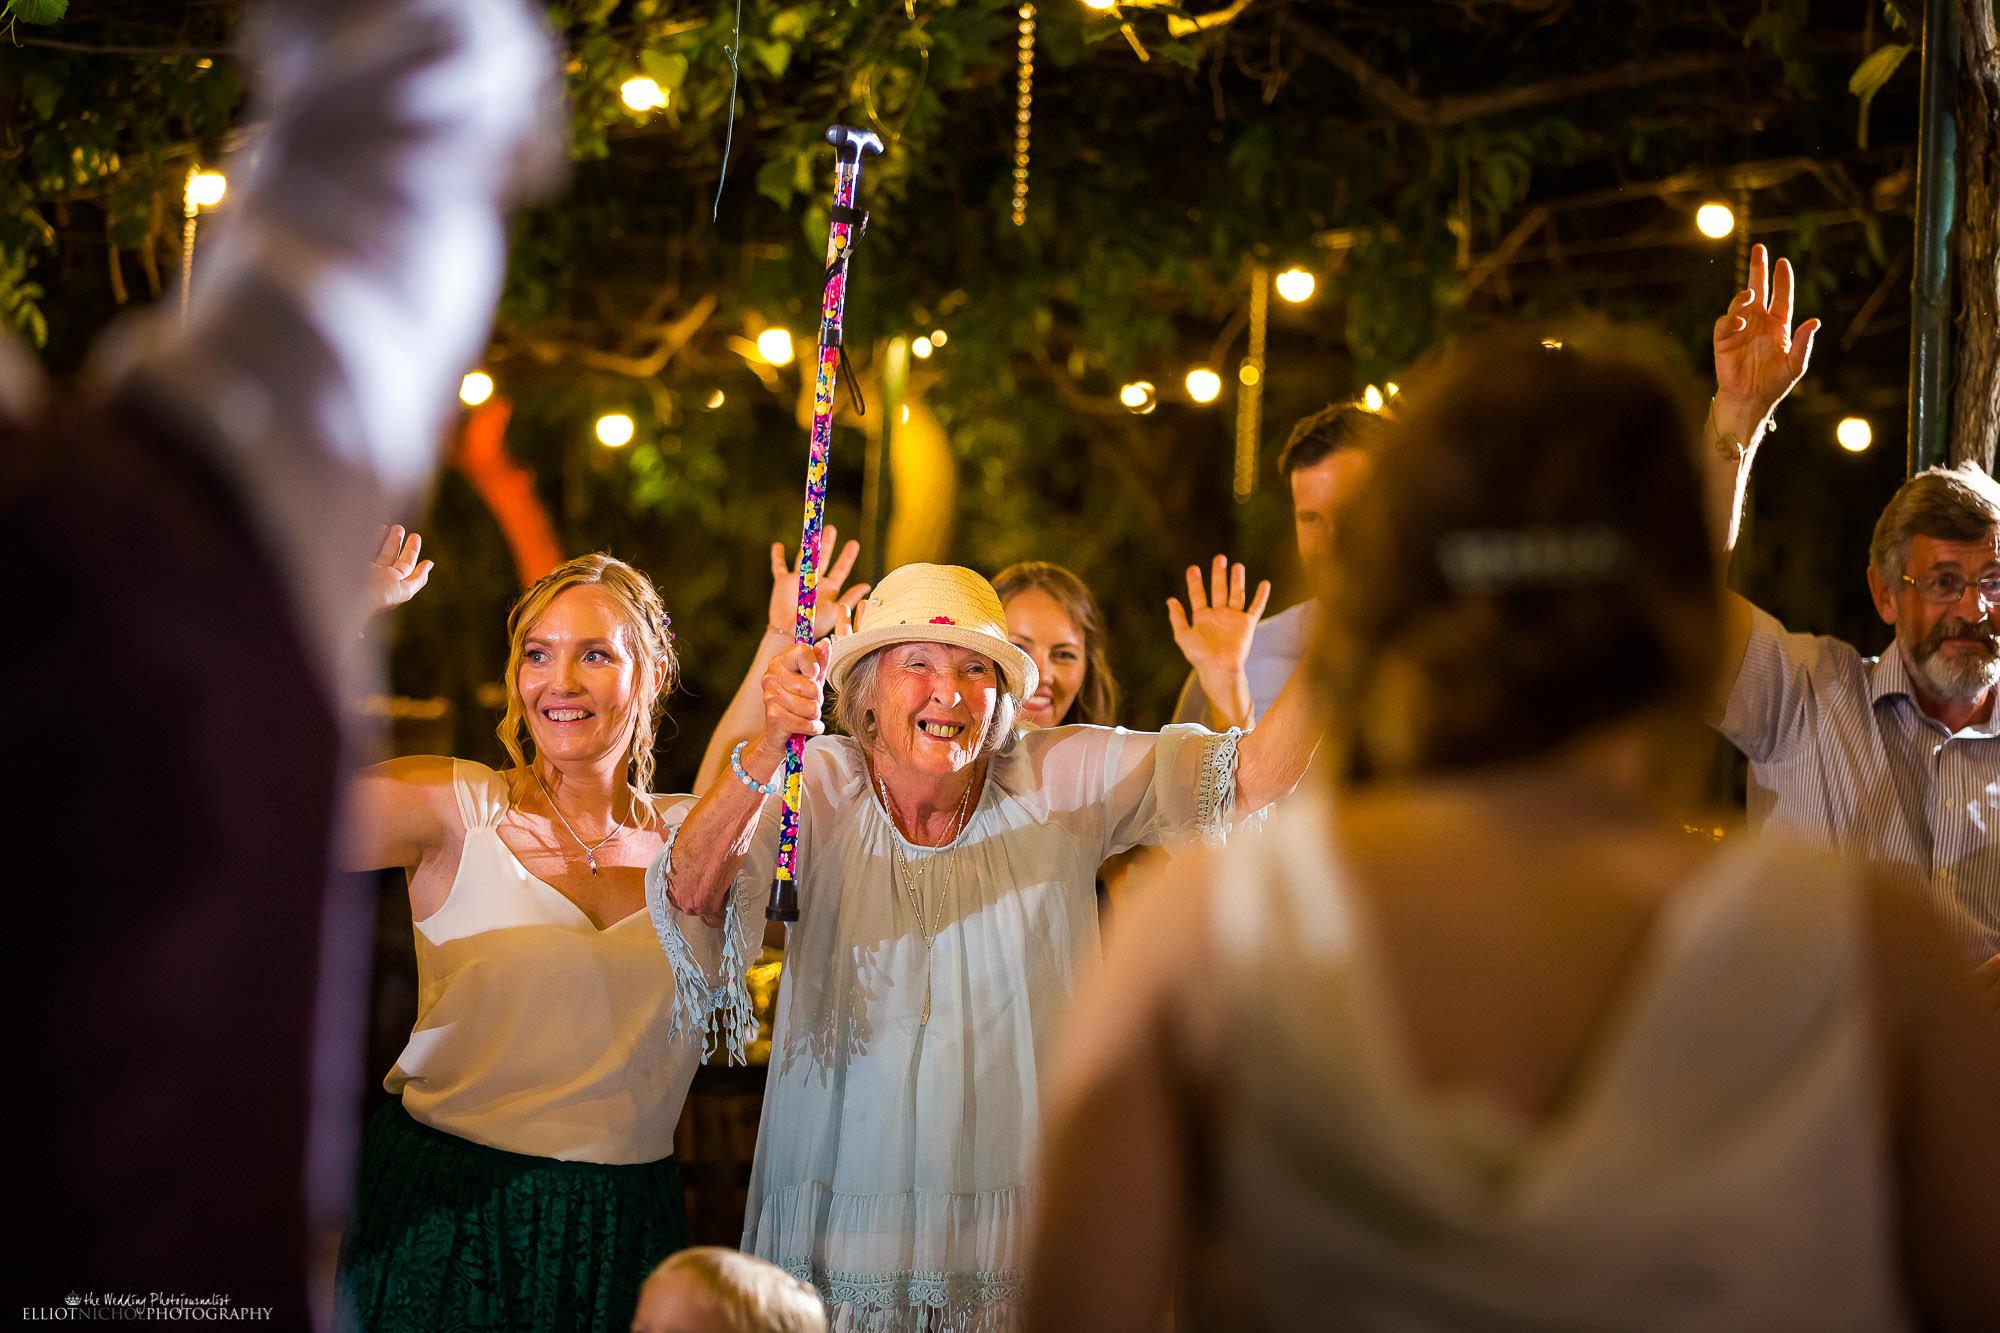 wedding-grandma-dancing-walking-stick-party-fun-wedding-photographer